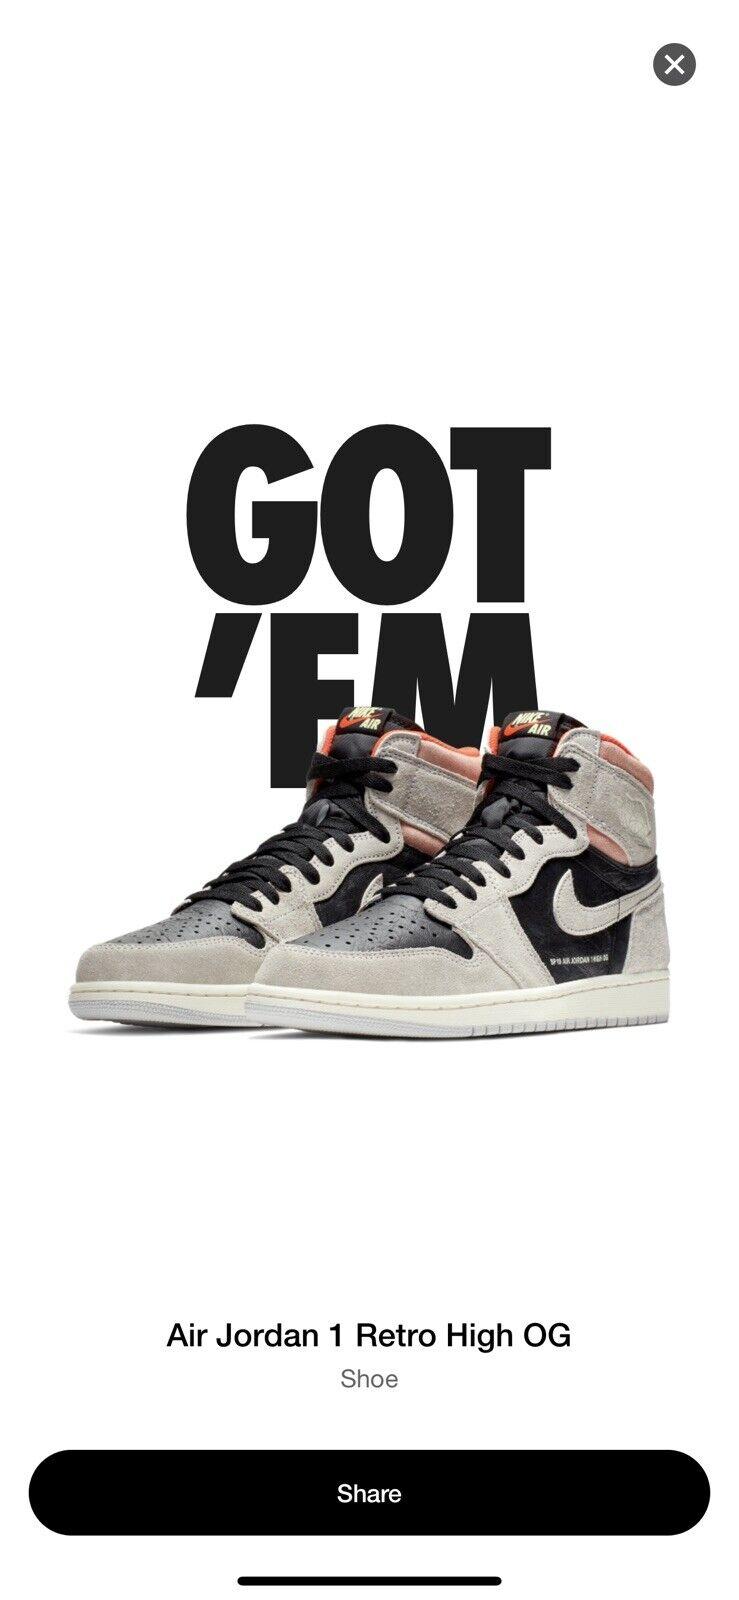 Nike Air Jordan 1 Retro High OG Black Grey UK10.5 Brand New Boxed With Receipt